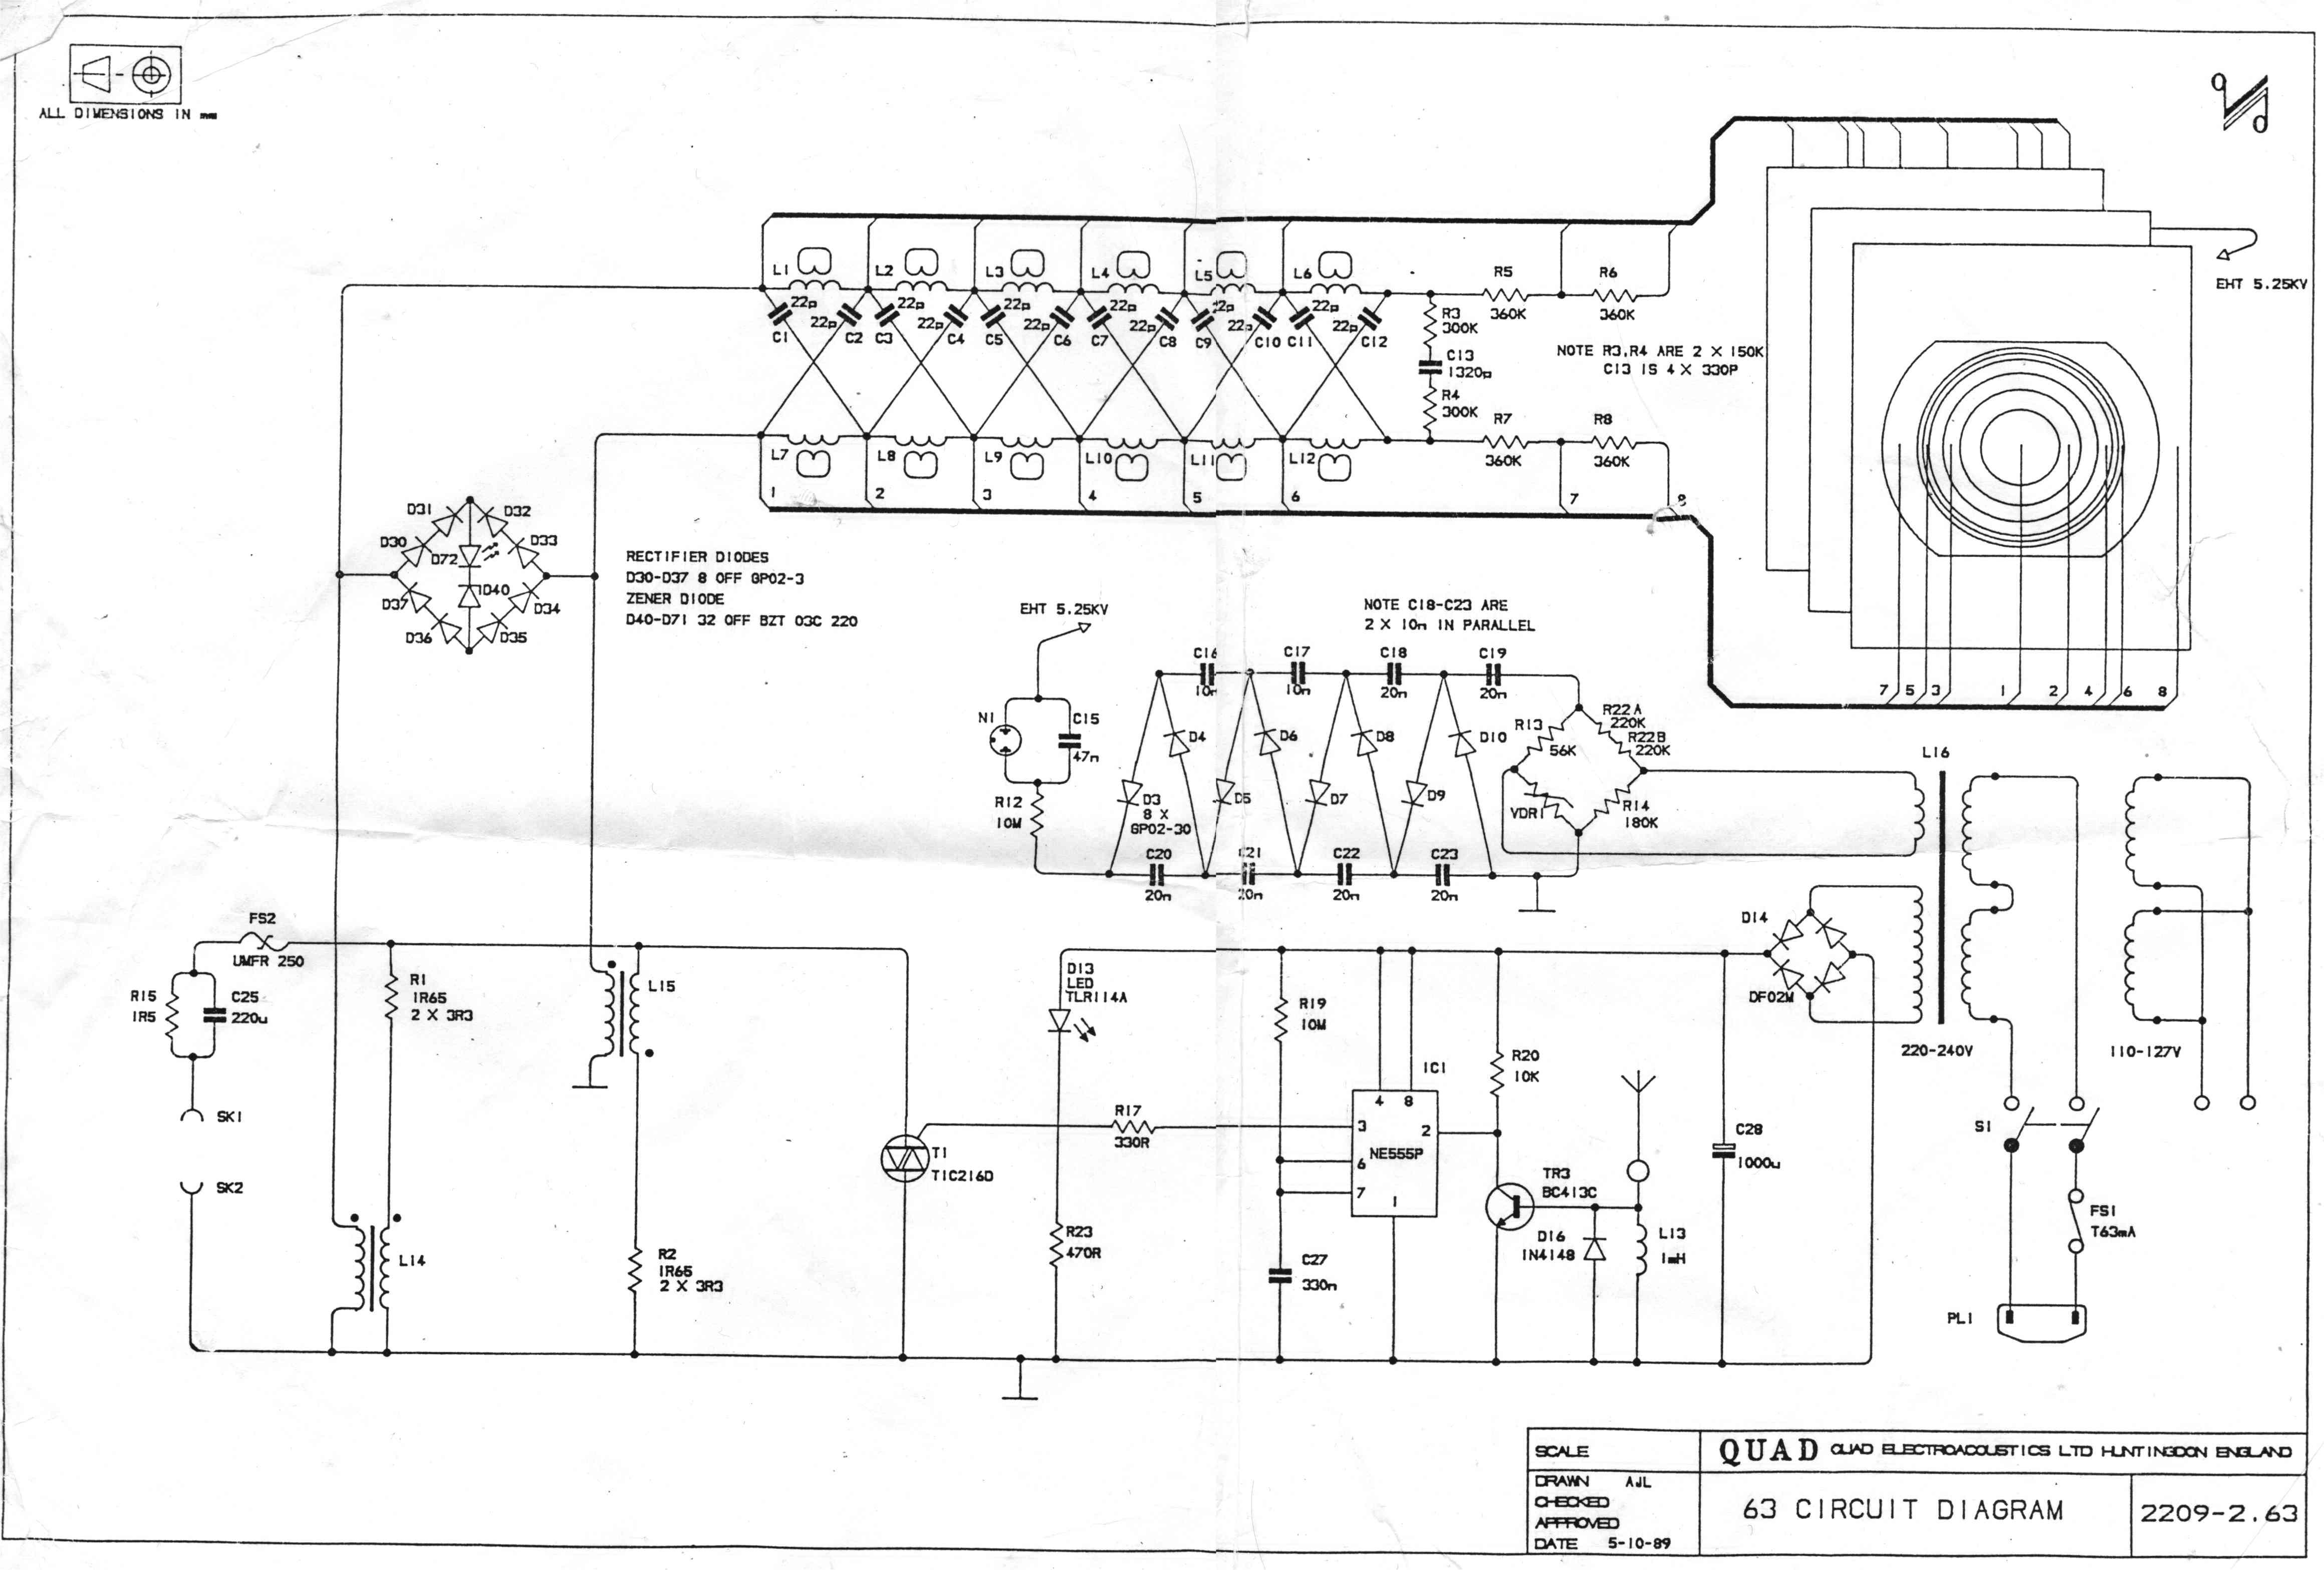 esl63 Quad Schematic on guitar pedal, electronic circuits, metal detector, star trek, high voltage, tube guitar amp, block diagram,